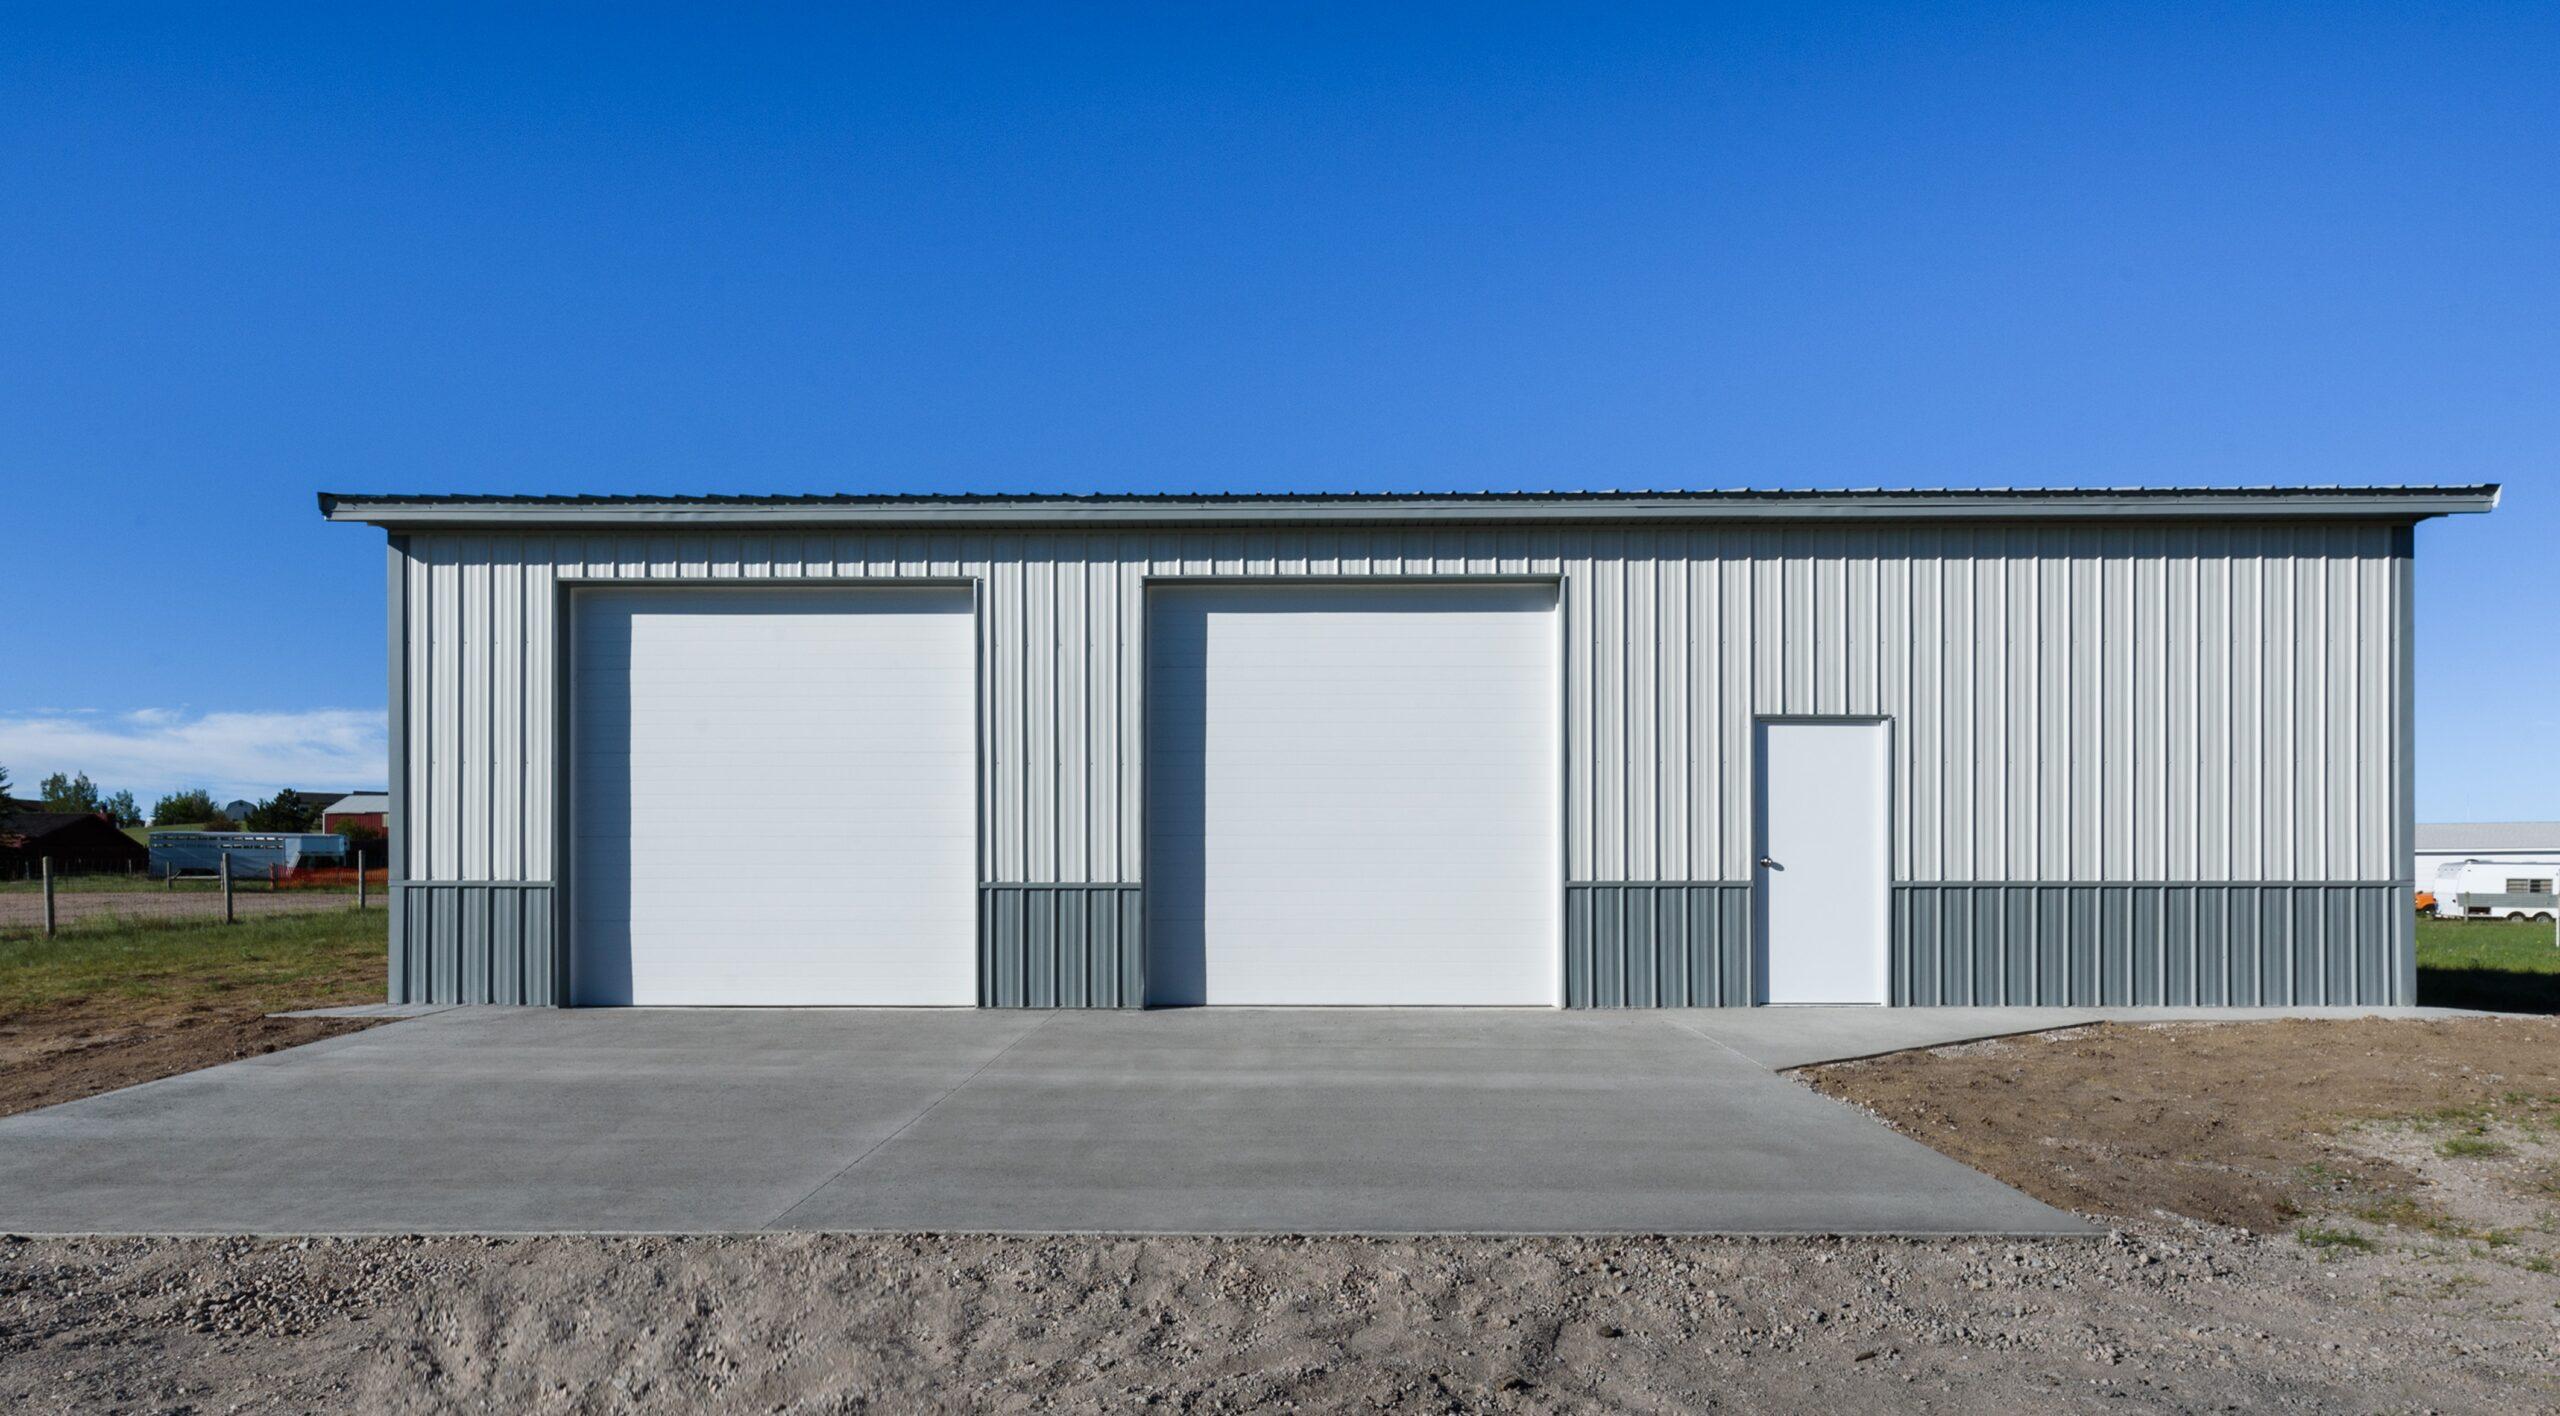 House + Garage Slabs